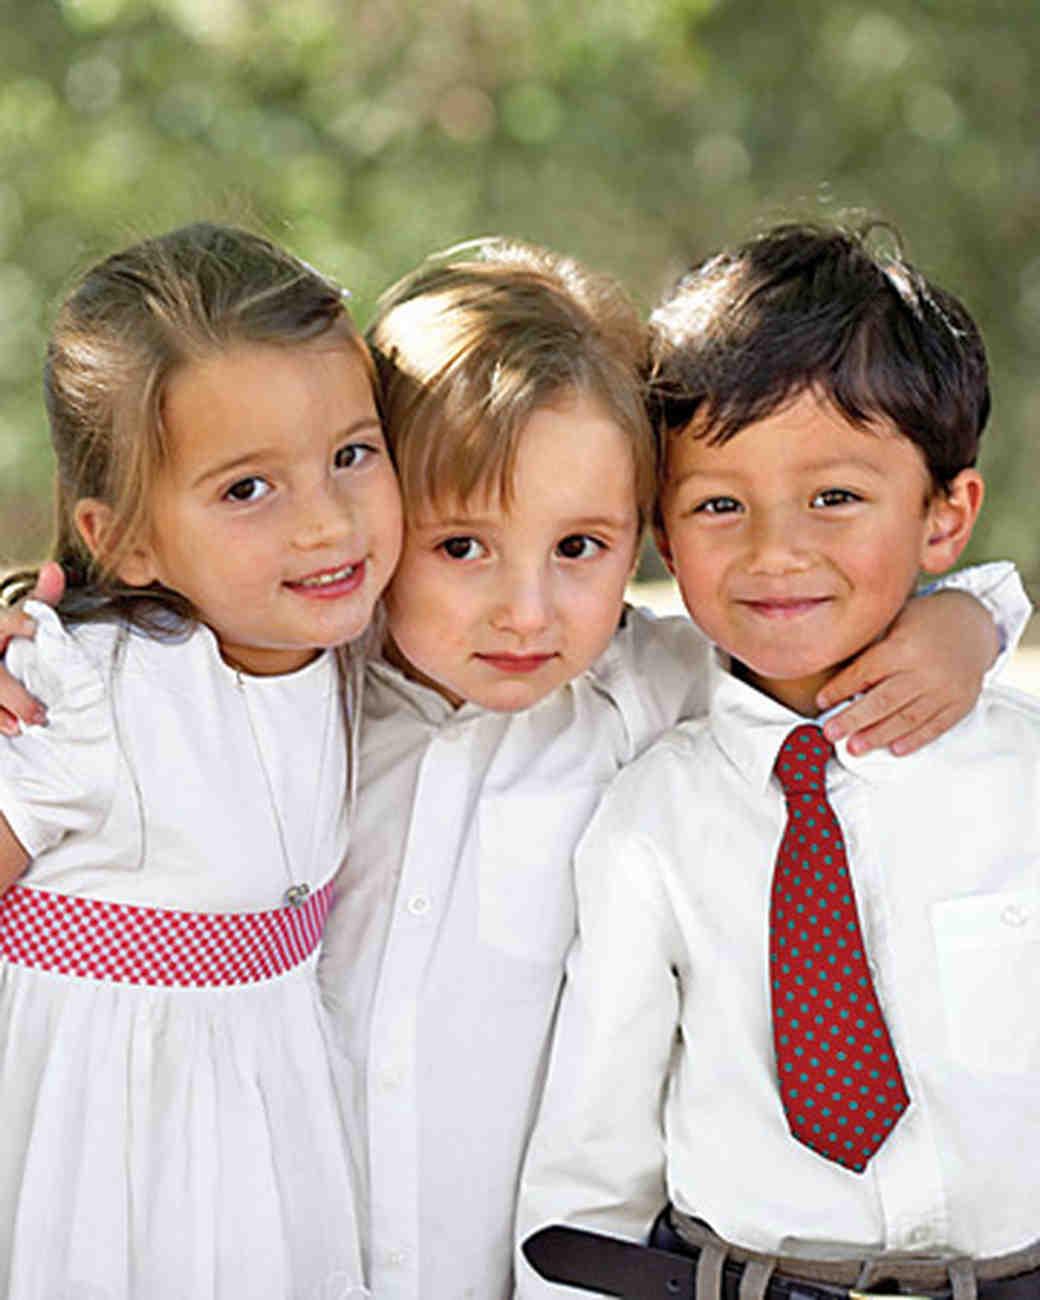 mws1644_1_fal08_sa_kids.jpg